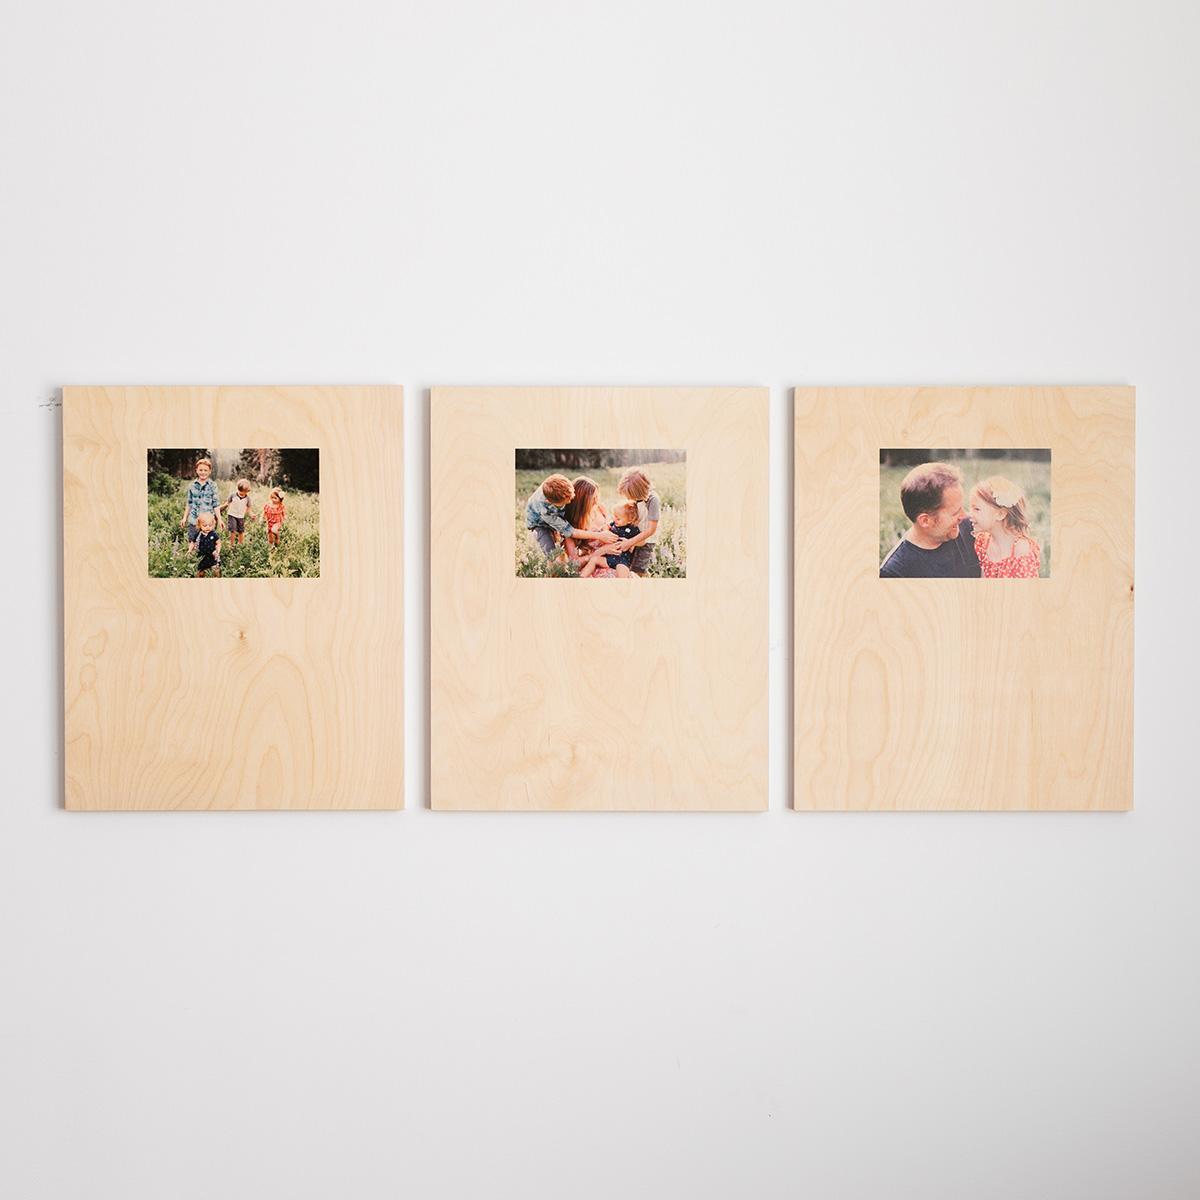 16x20 PhotoBoards